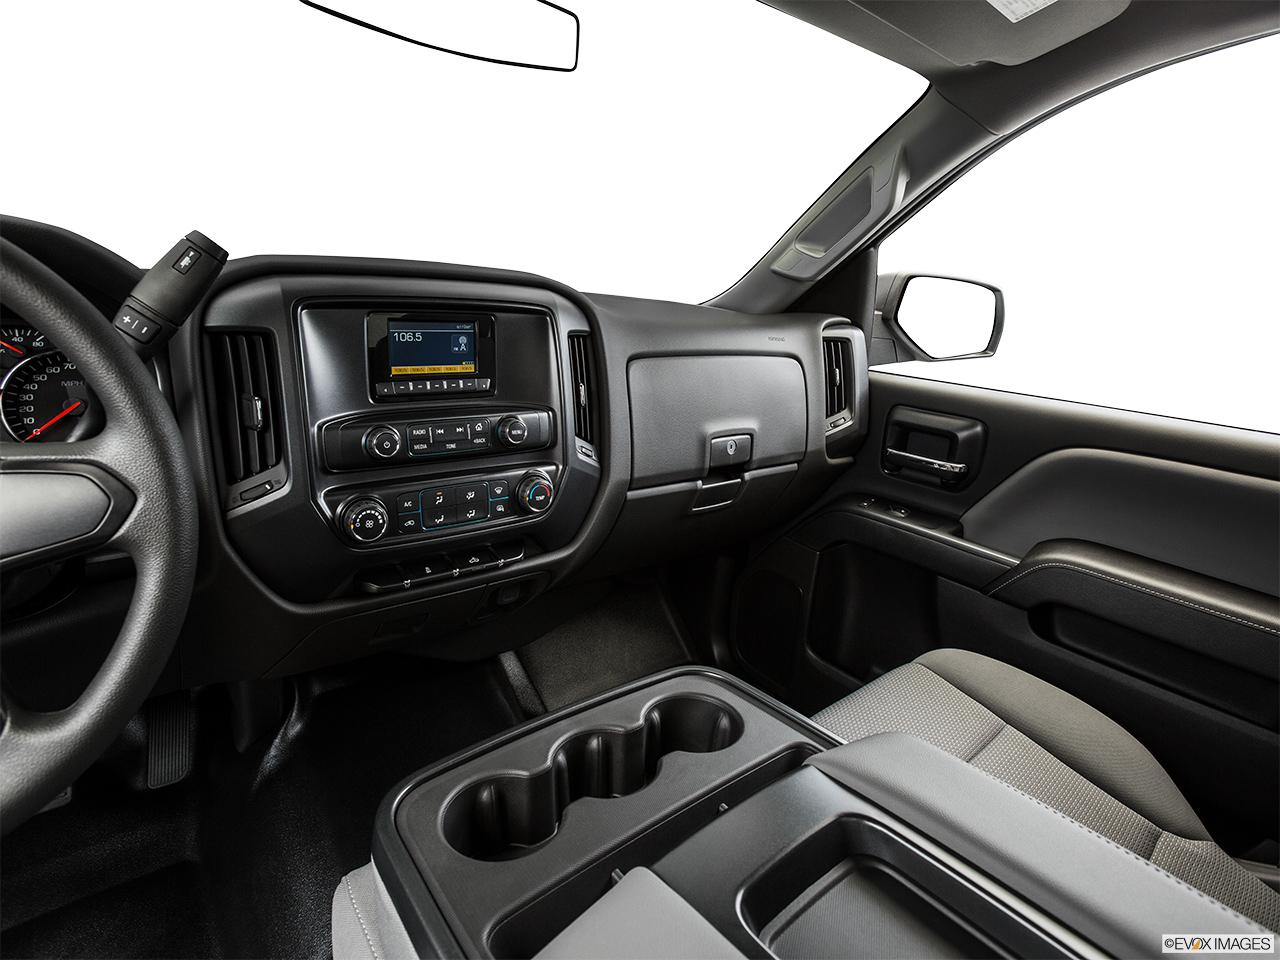 2015 Chevrolet Silverado 2500hd 4wd Reg Cab 1336 Work Truck Chevy Center Console Passenger Side